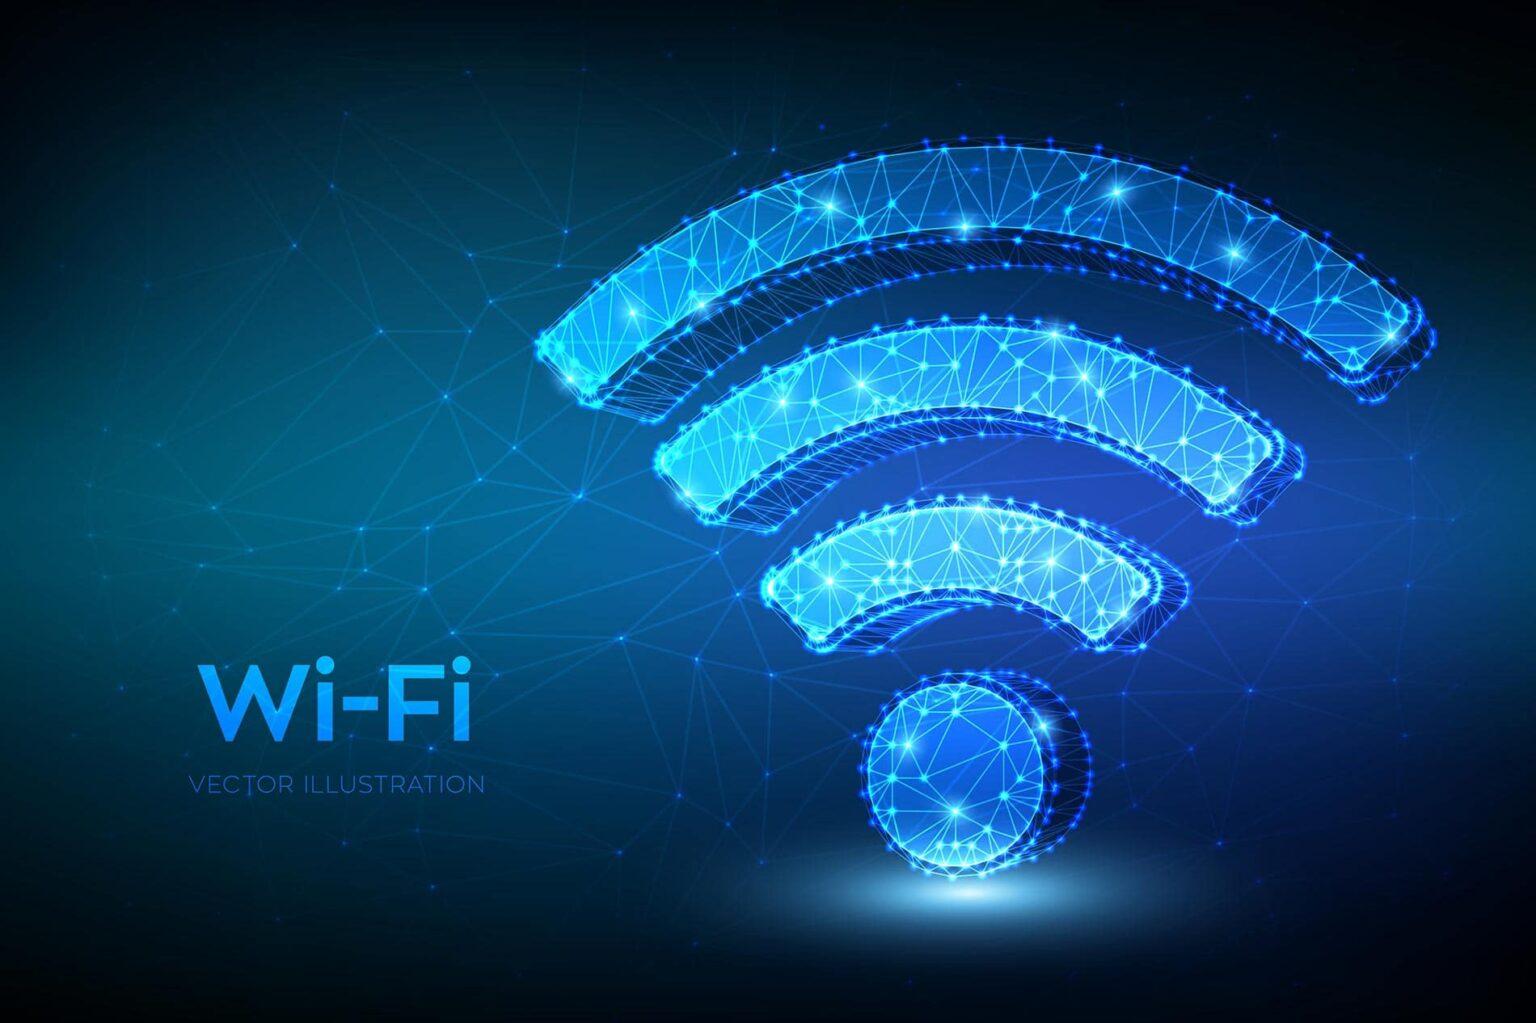 Wi-Fi - Internet service providers